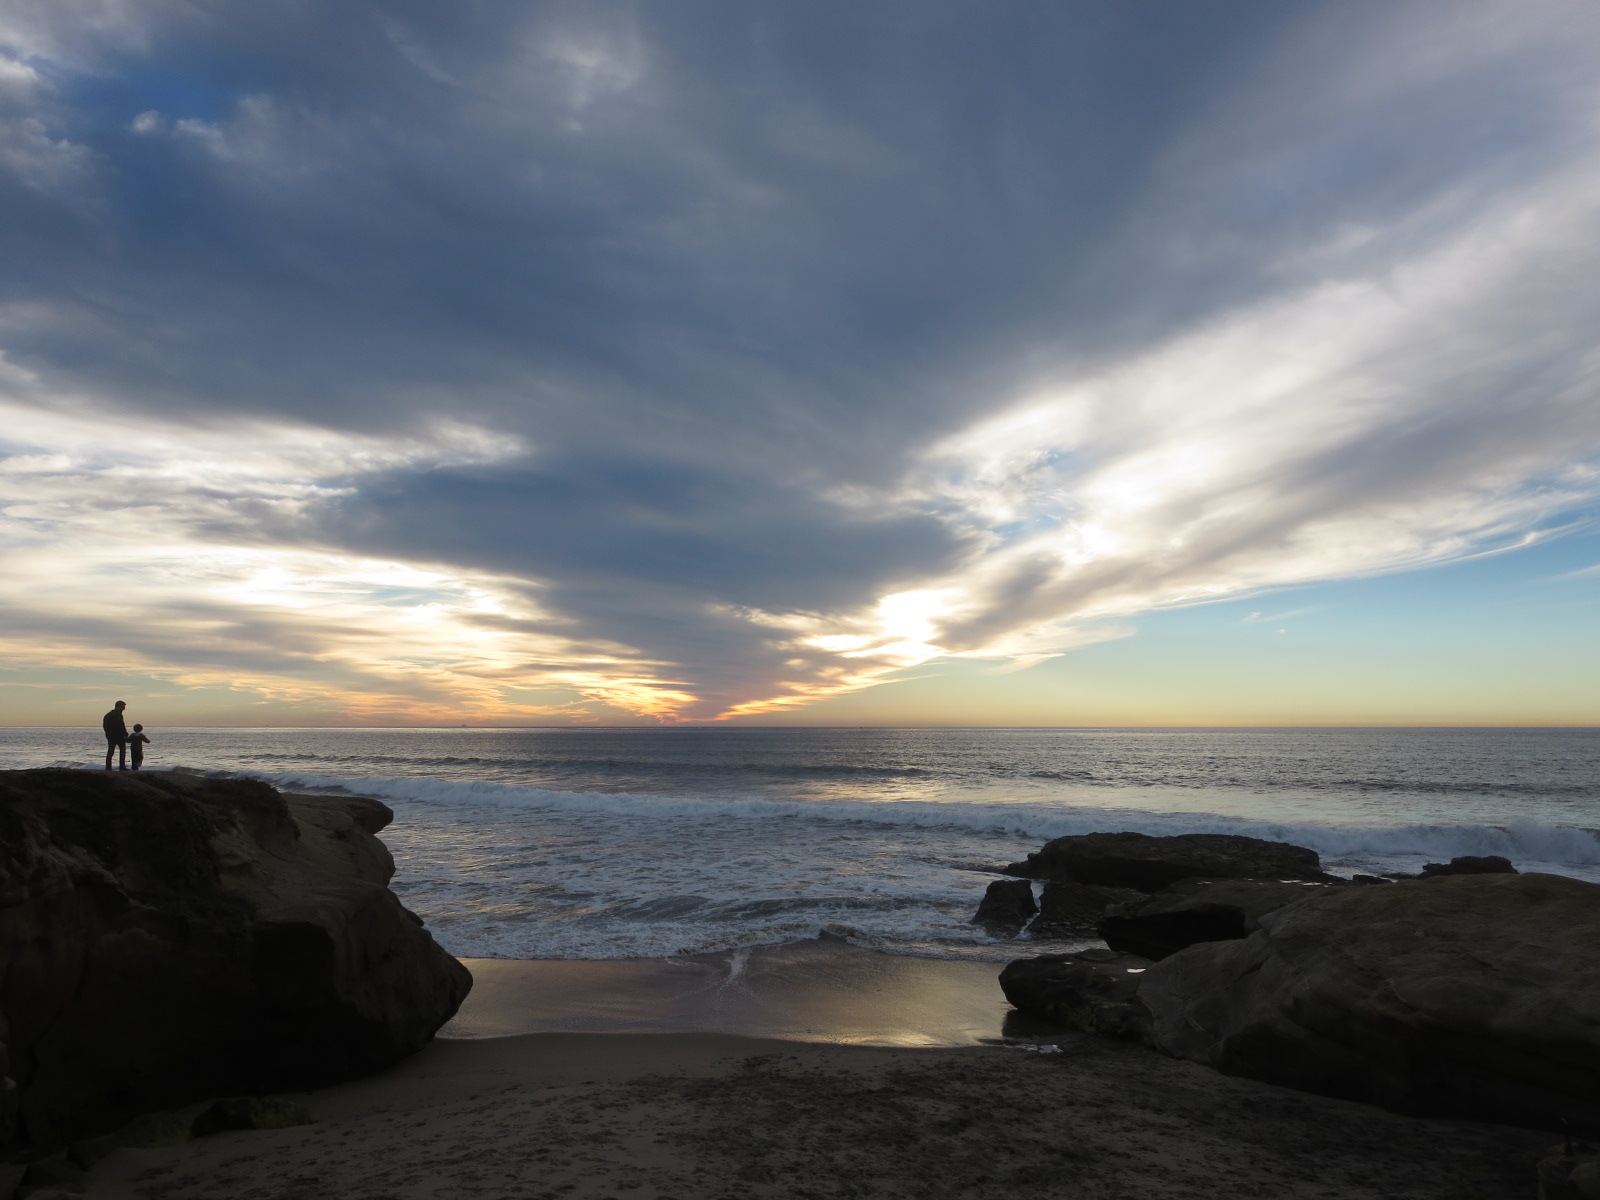 Sunset Cliffs, San Diego, CA,USA.